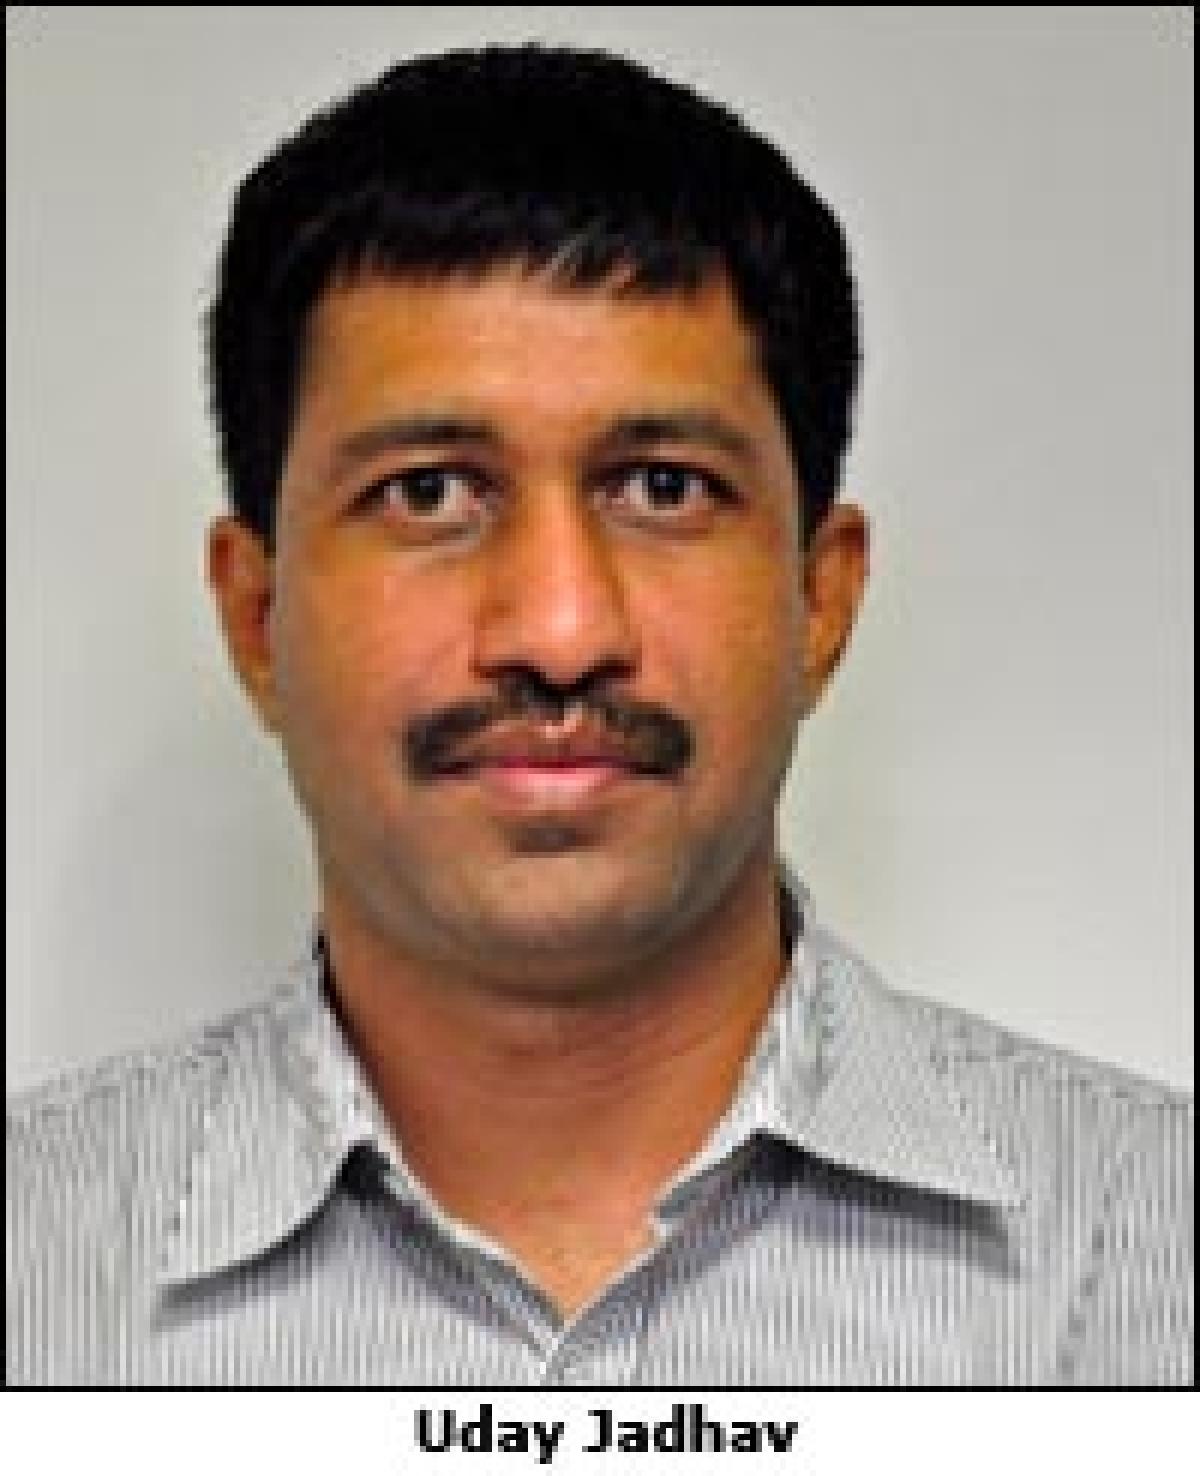 Sakal appoints LS Krishnan as business head; promotes Uday Jadhav as director, corporate development